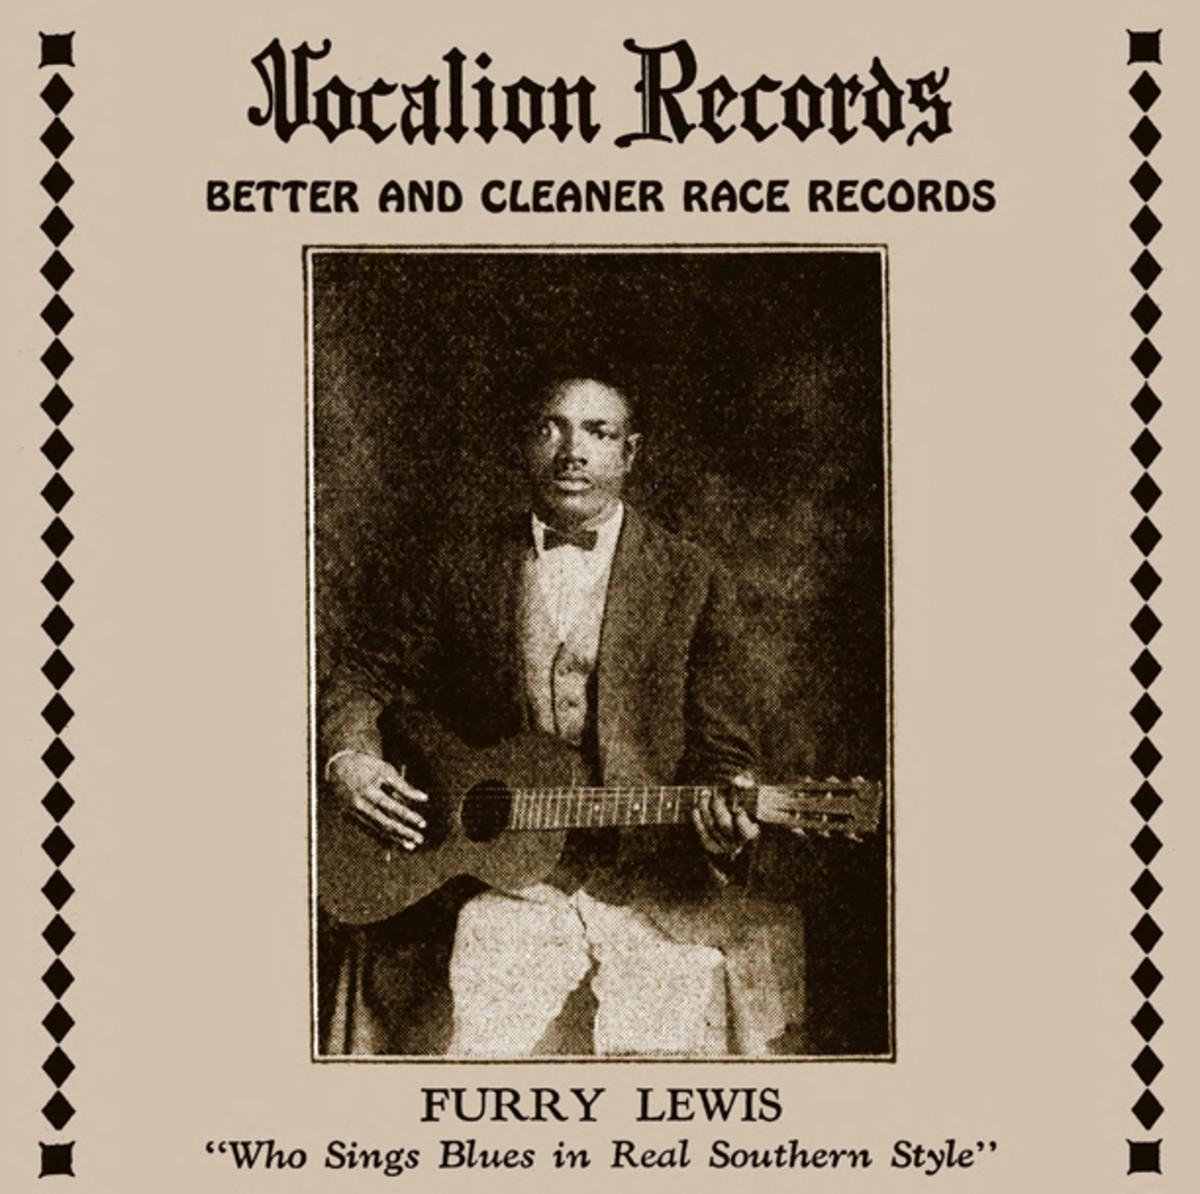 Furry Lewis Vocalion Records